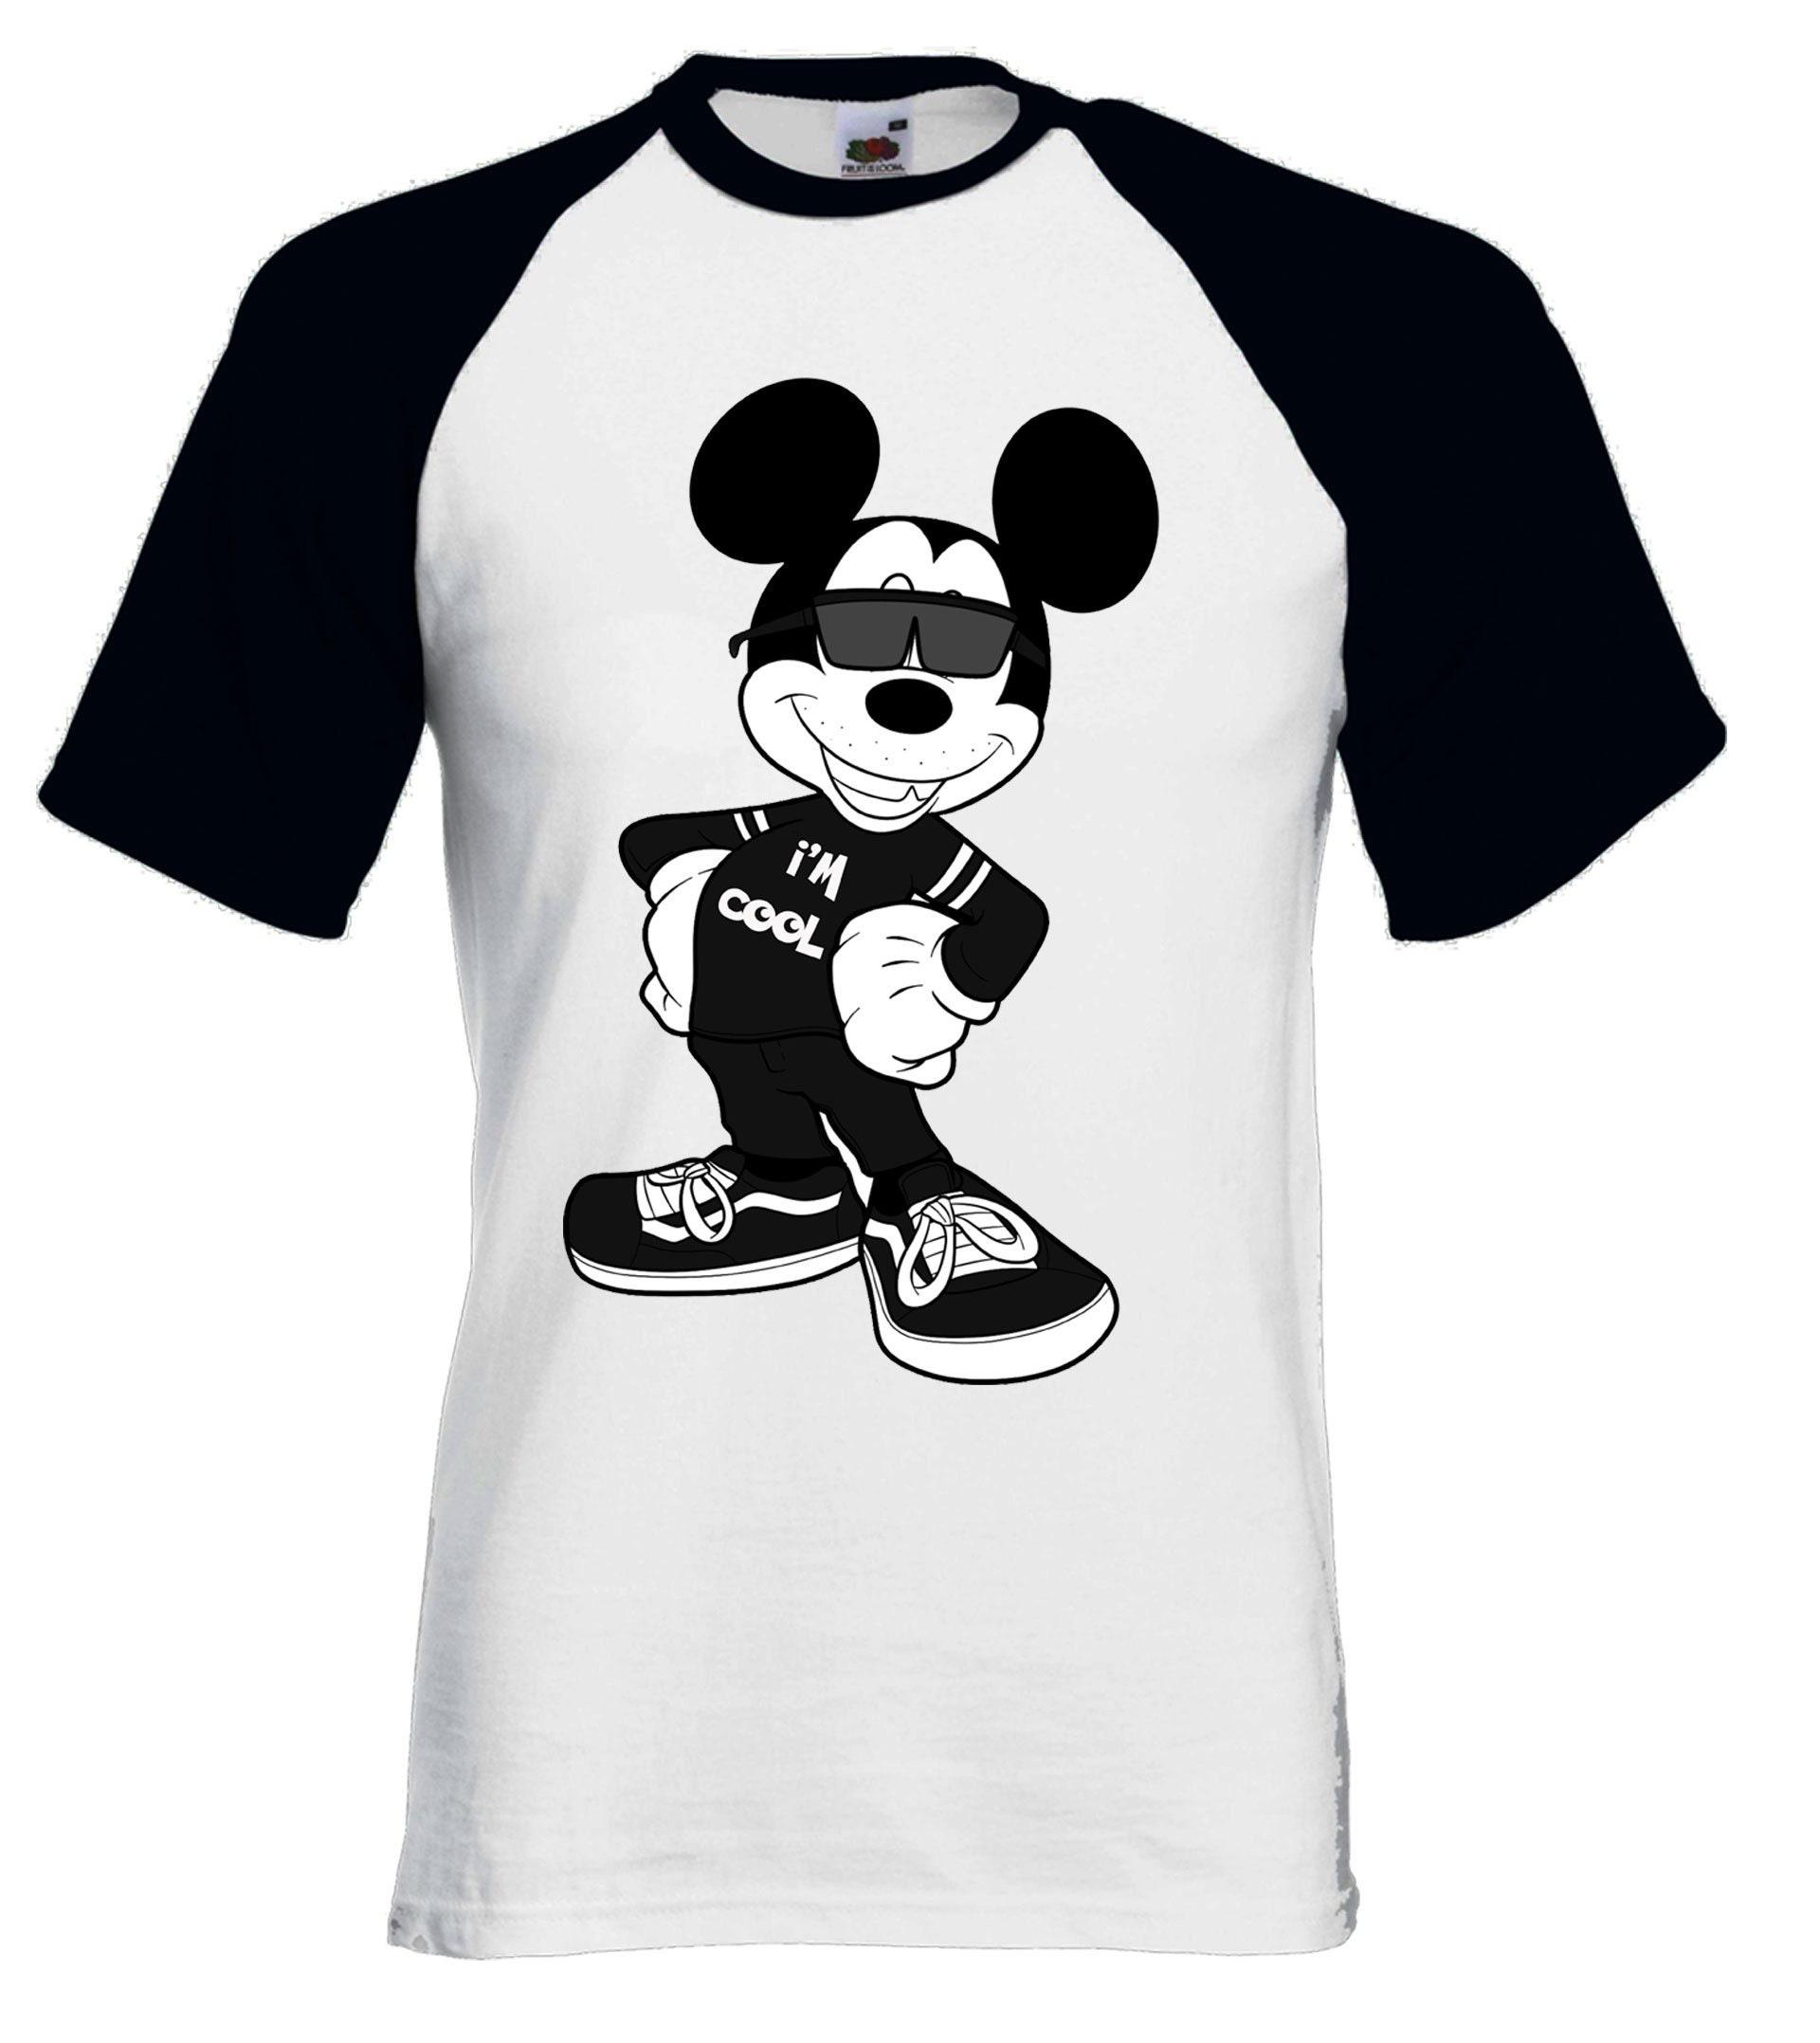 b14a4ce90 Mickey Mouse Shirts Funny Mickey Mouse T-Shirts Disney Shirts   Etsy